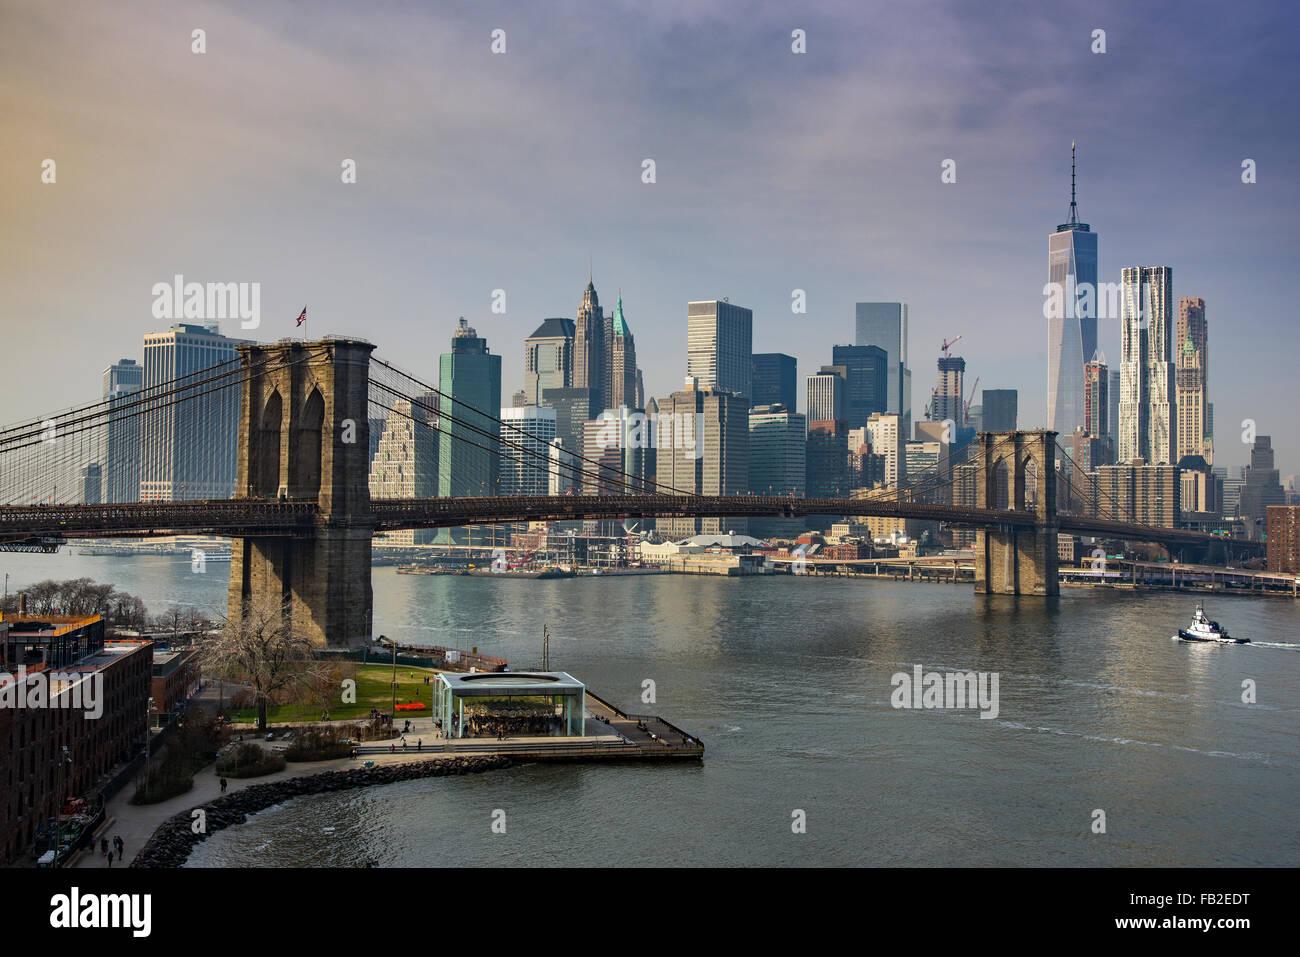 Brooklyn Bridge und Lower Manhattan Skyline, New York, USA Stockbild